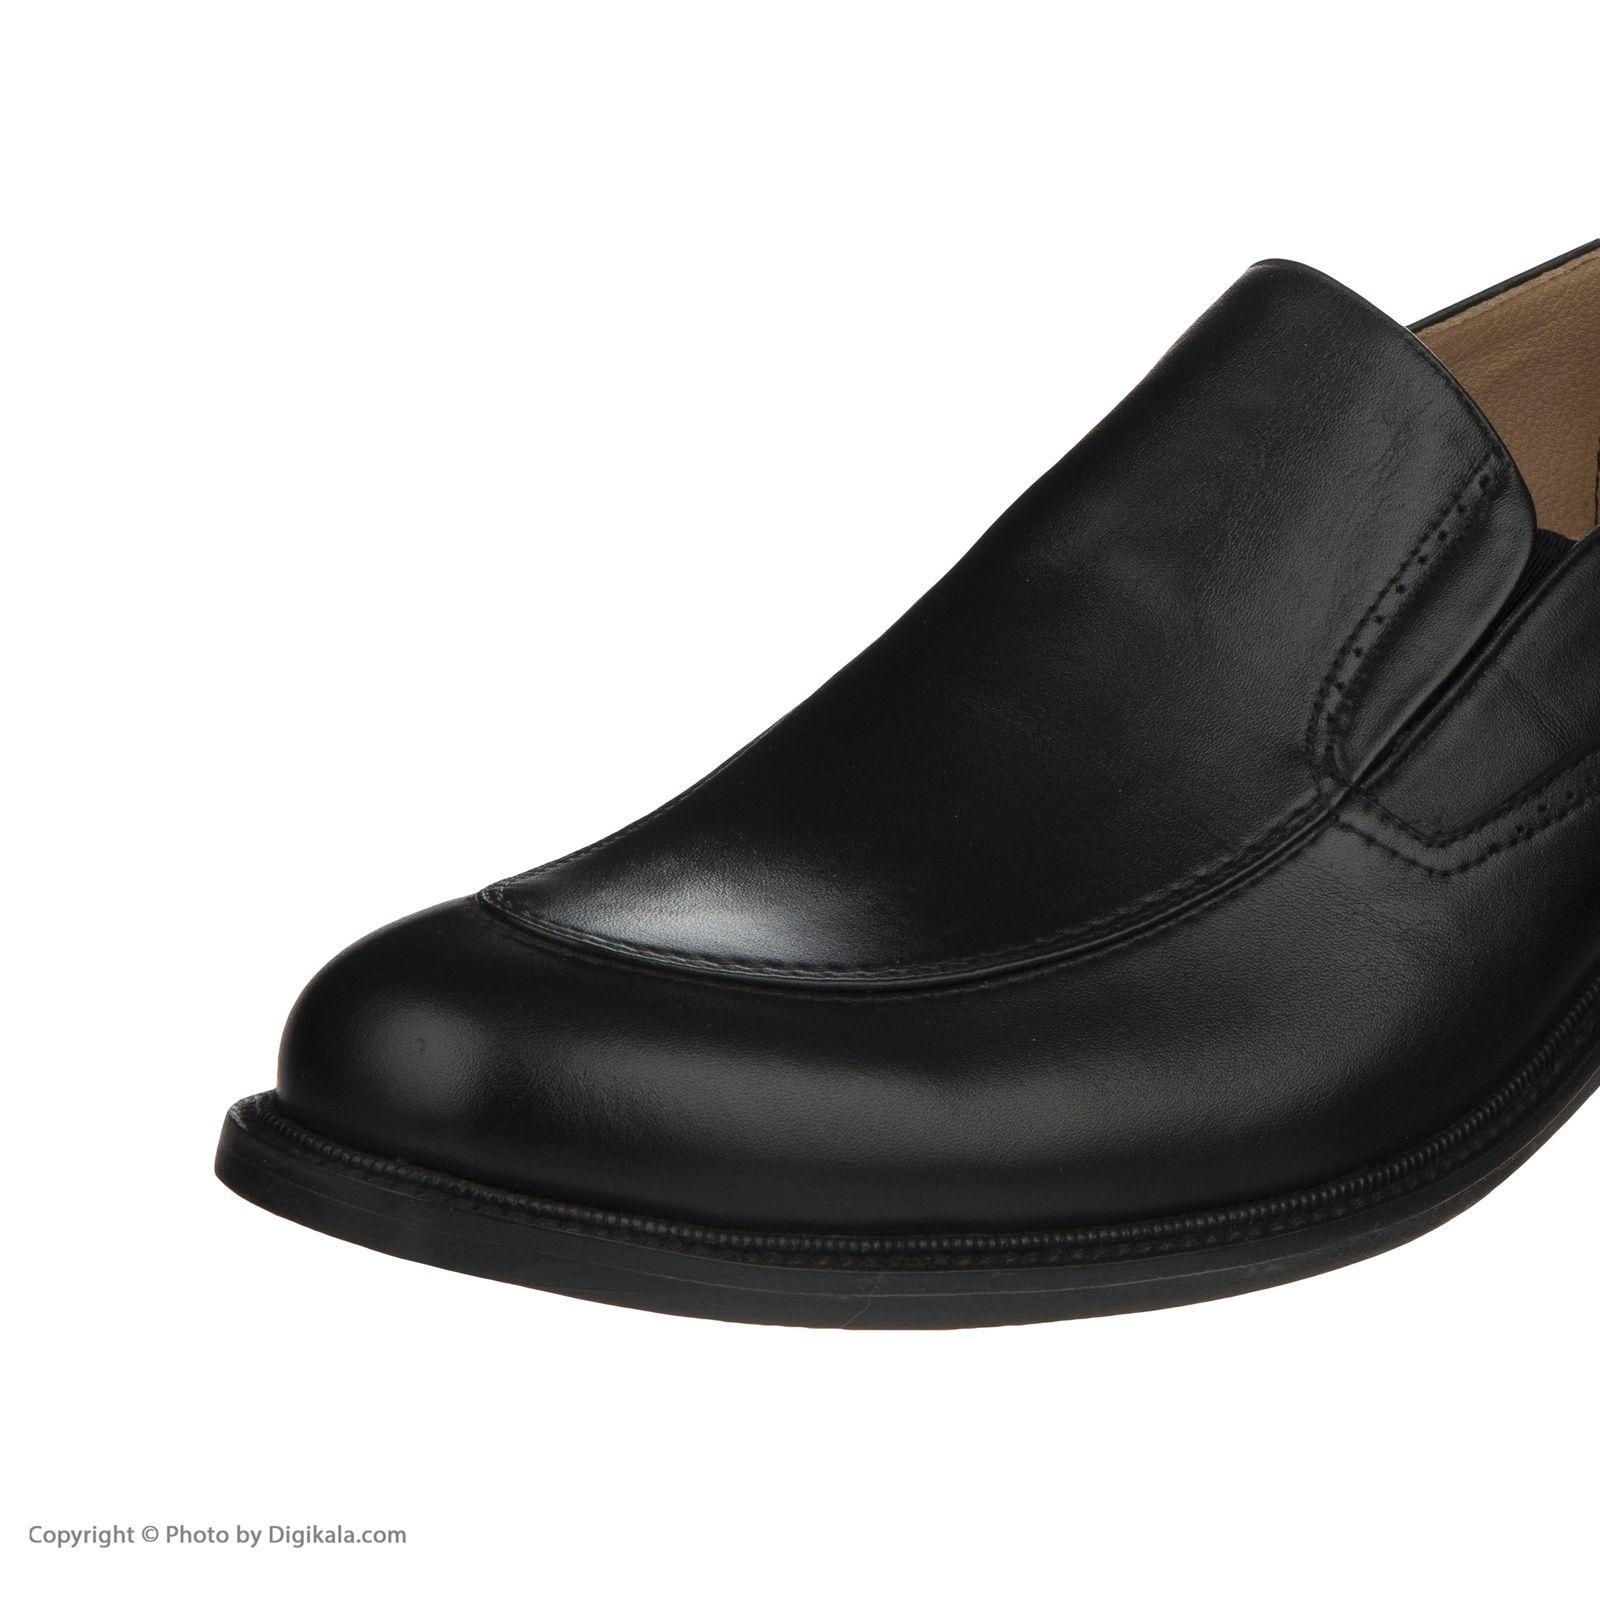 کفش مردانه نظری کد 426 -  - 6